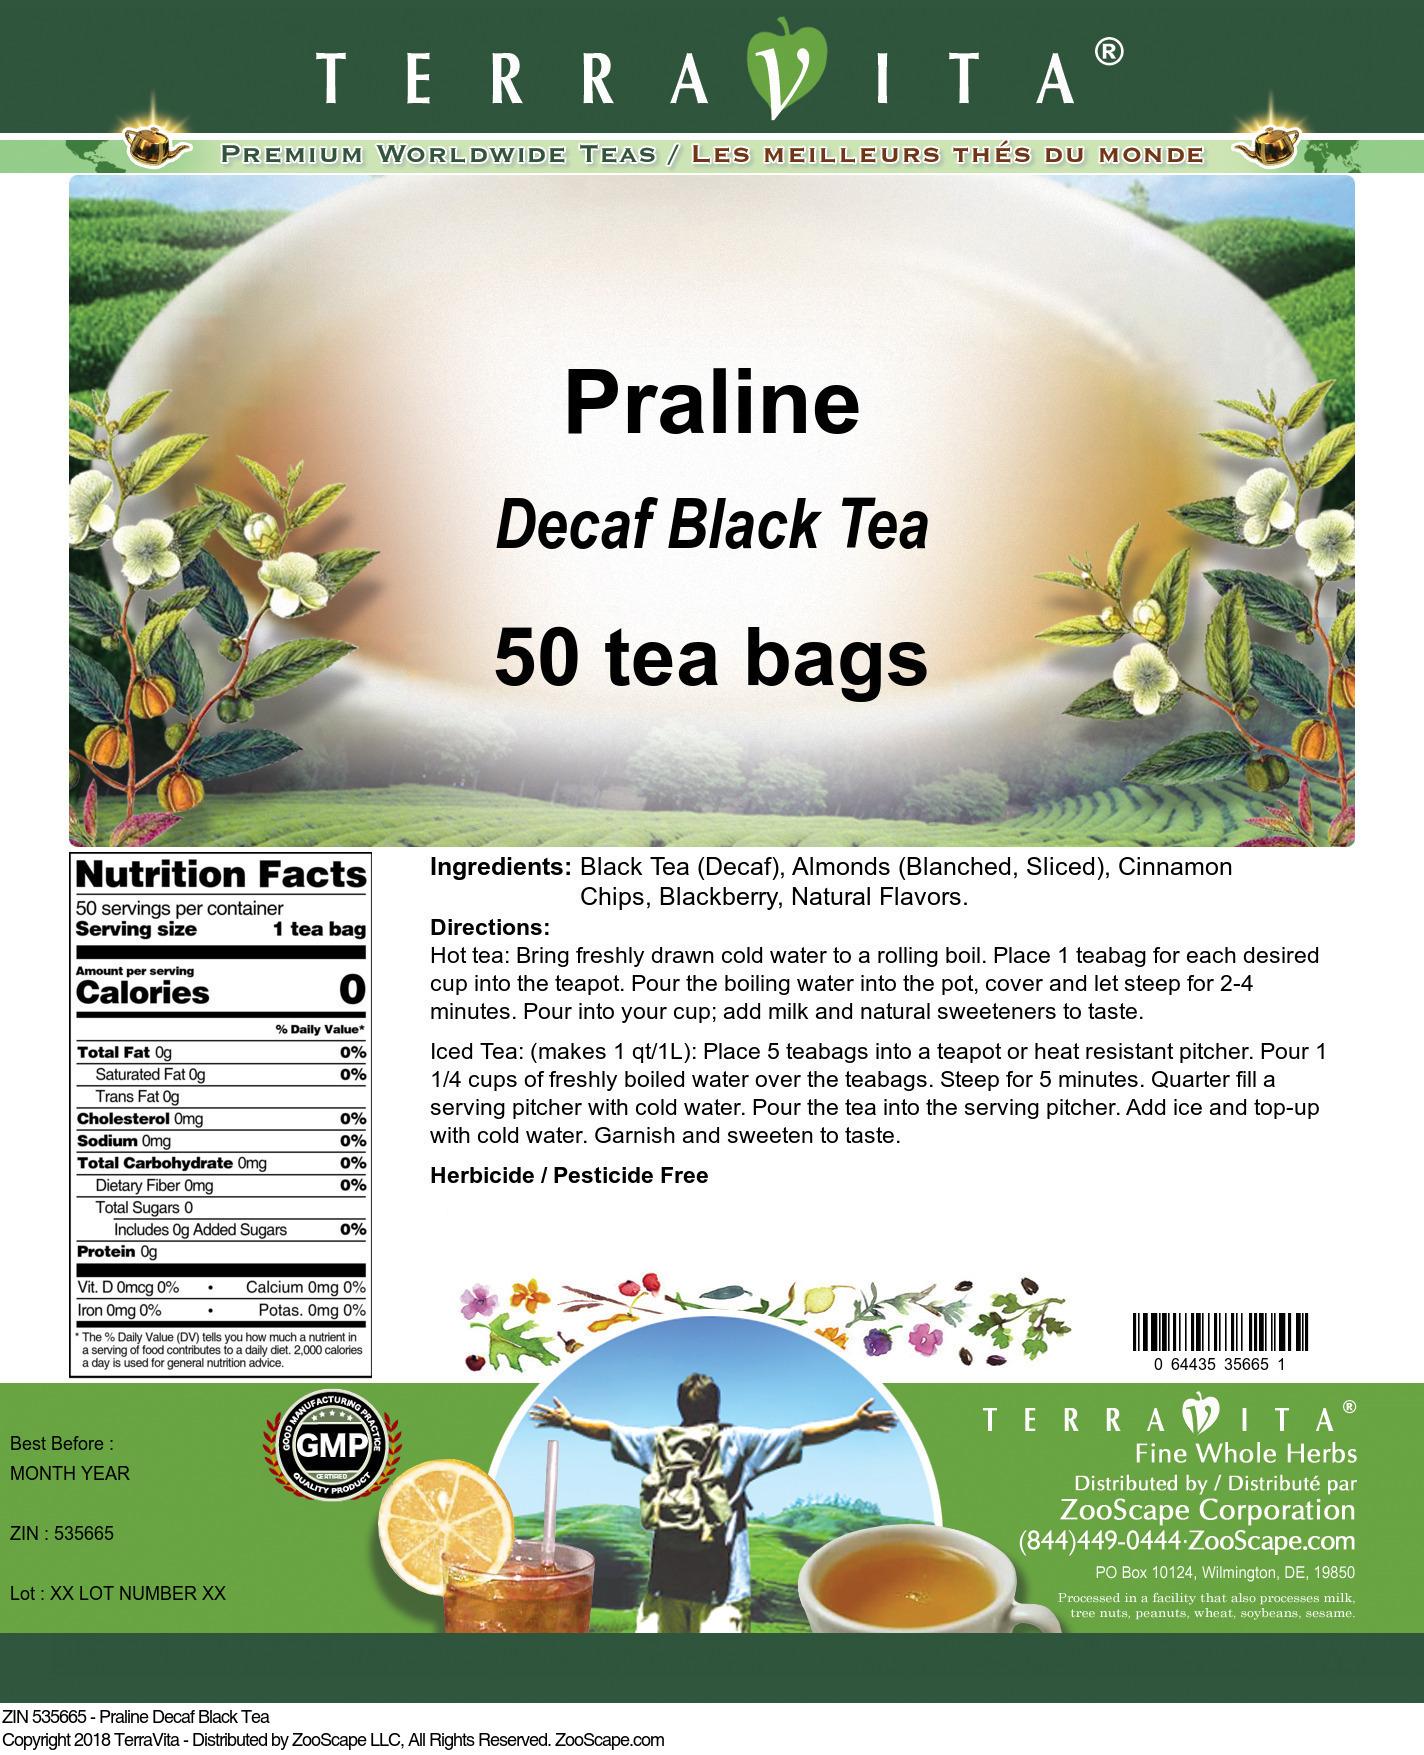 Praline Decaf Black Tea